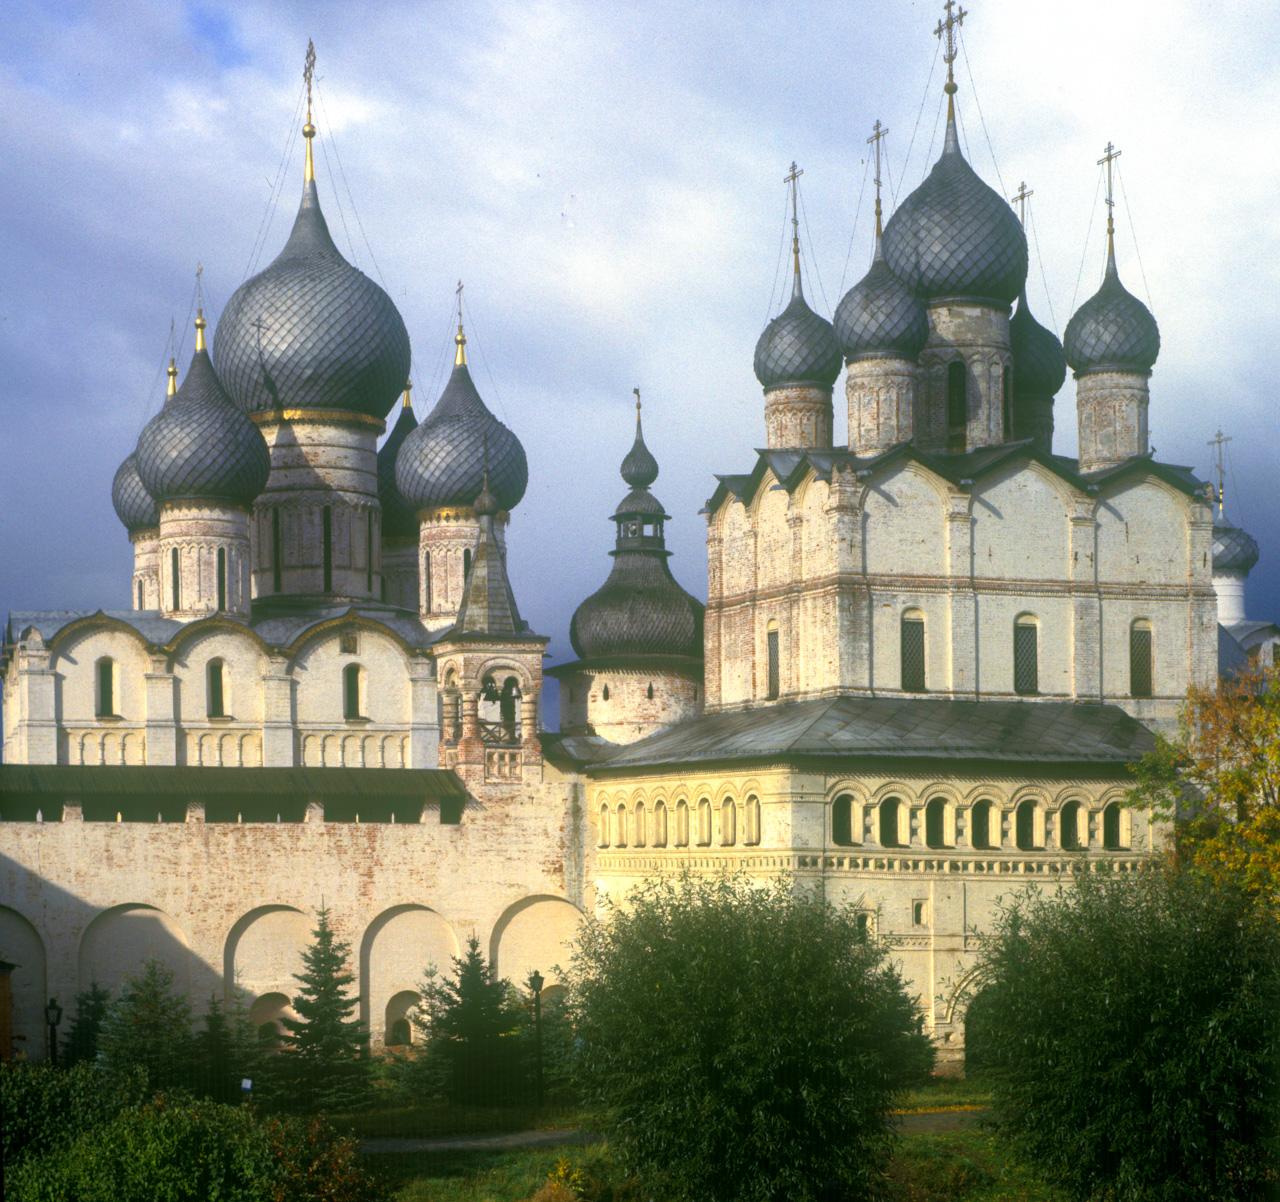 Rostov kremlin. Church of Resurrection (right), north wall, Dormition Cathedral. Oct. 4, 1992. / Photo: William Brumfield